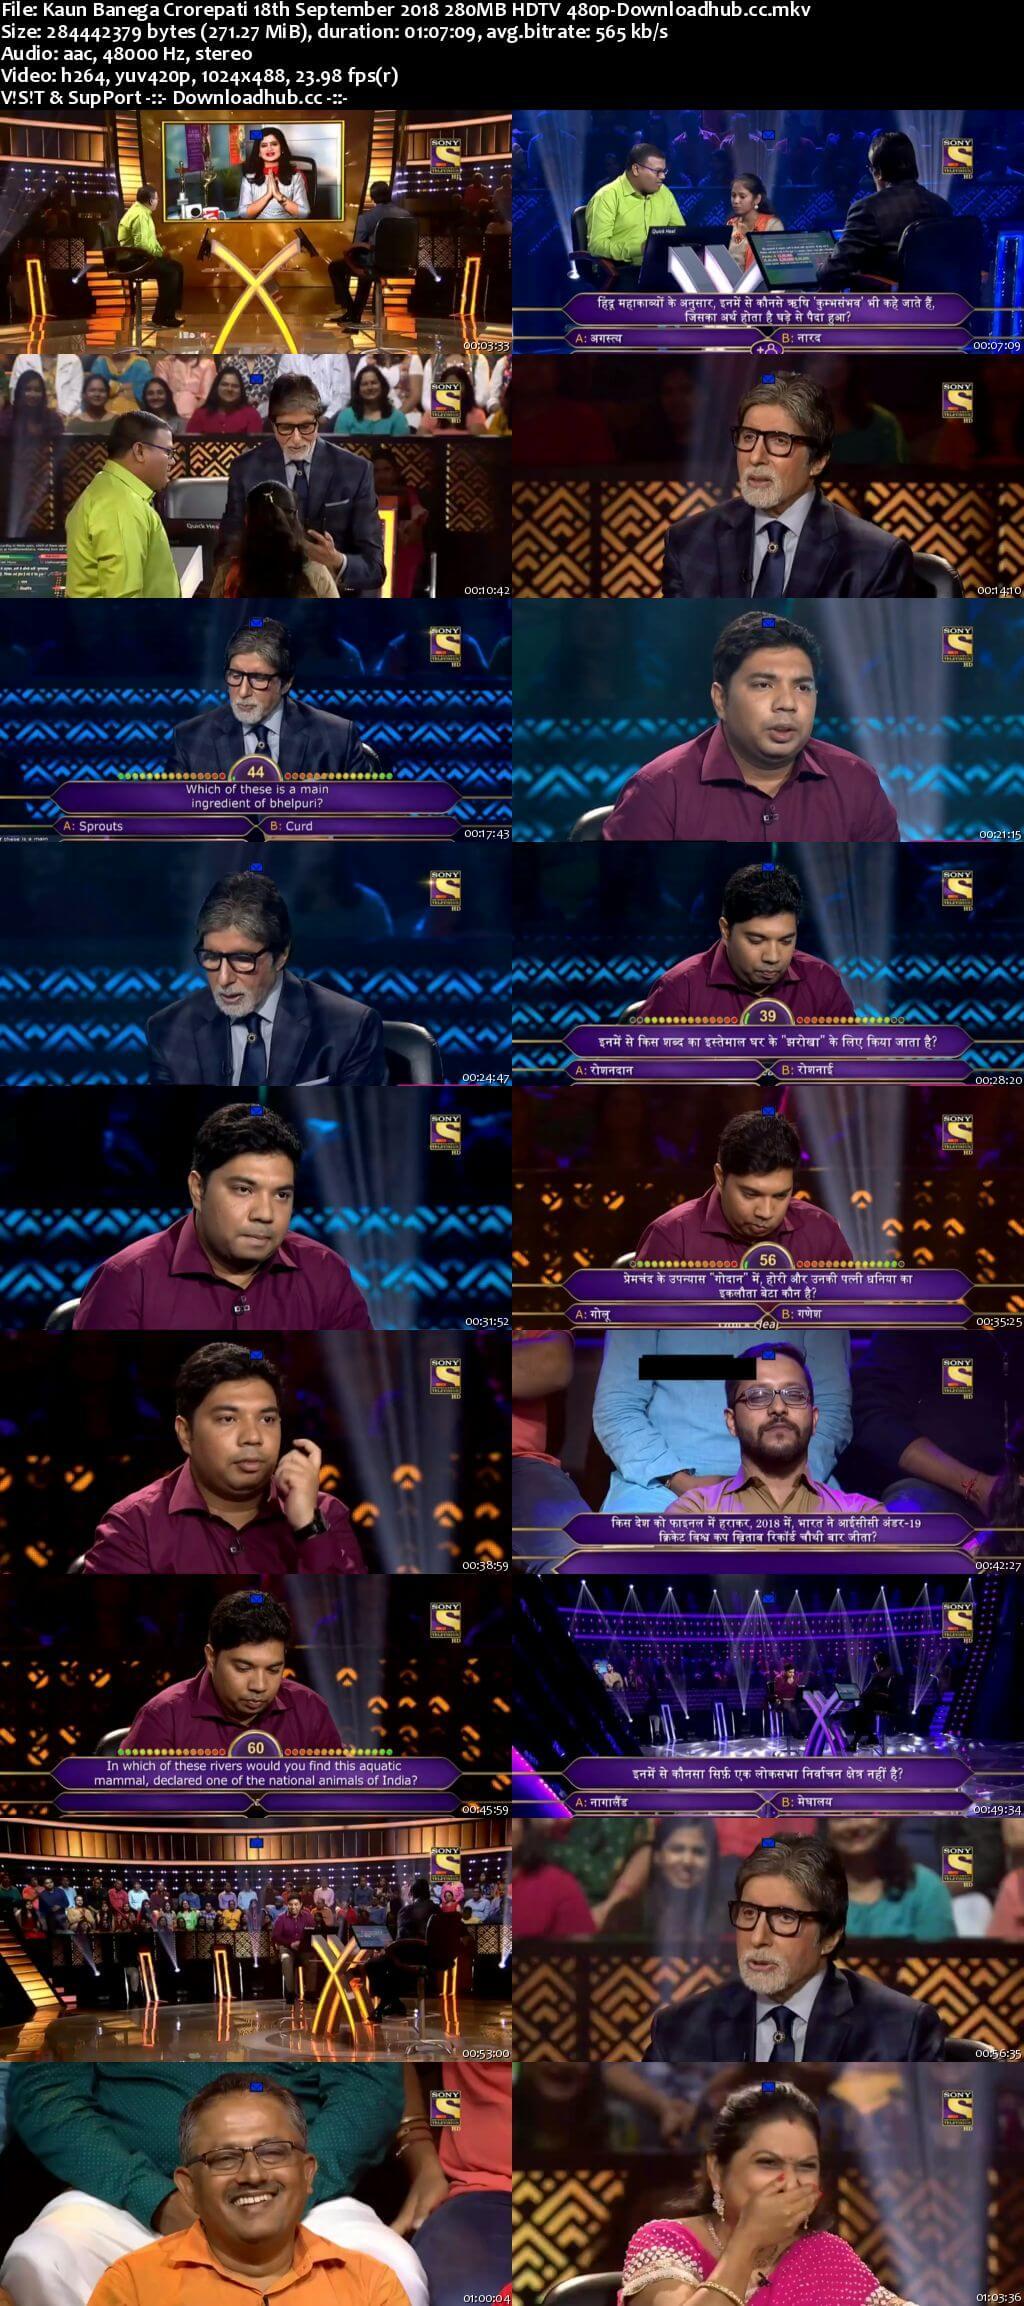 Kaun Banega Crorepati 18th September 2018 280MB HDTV 480p